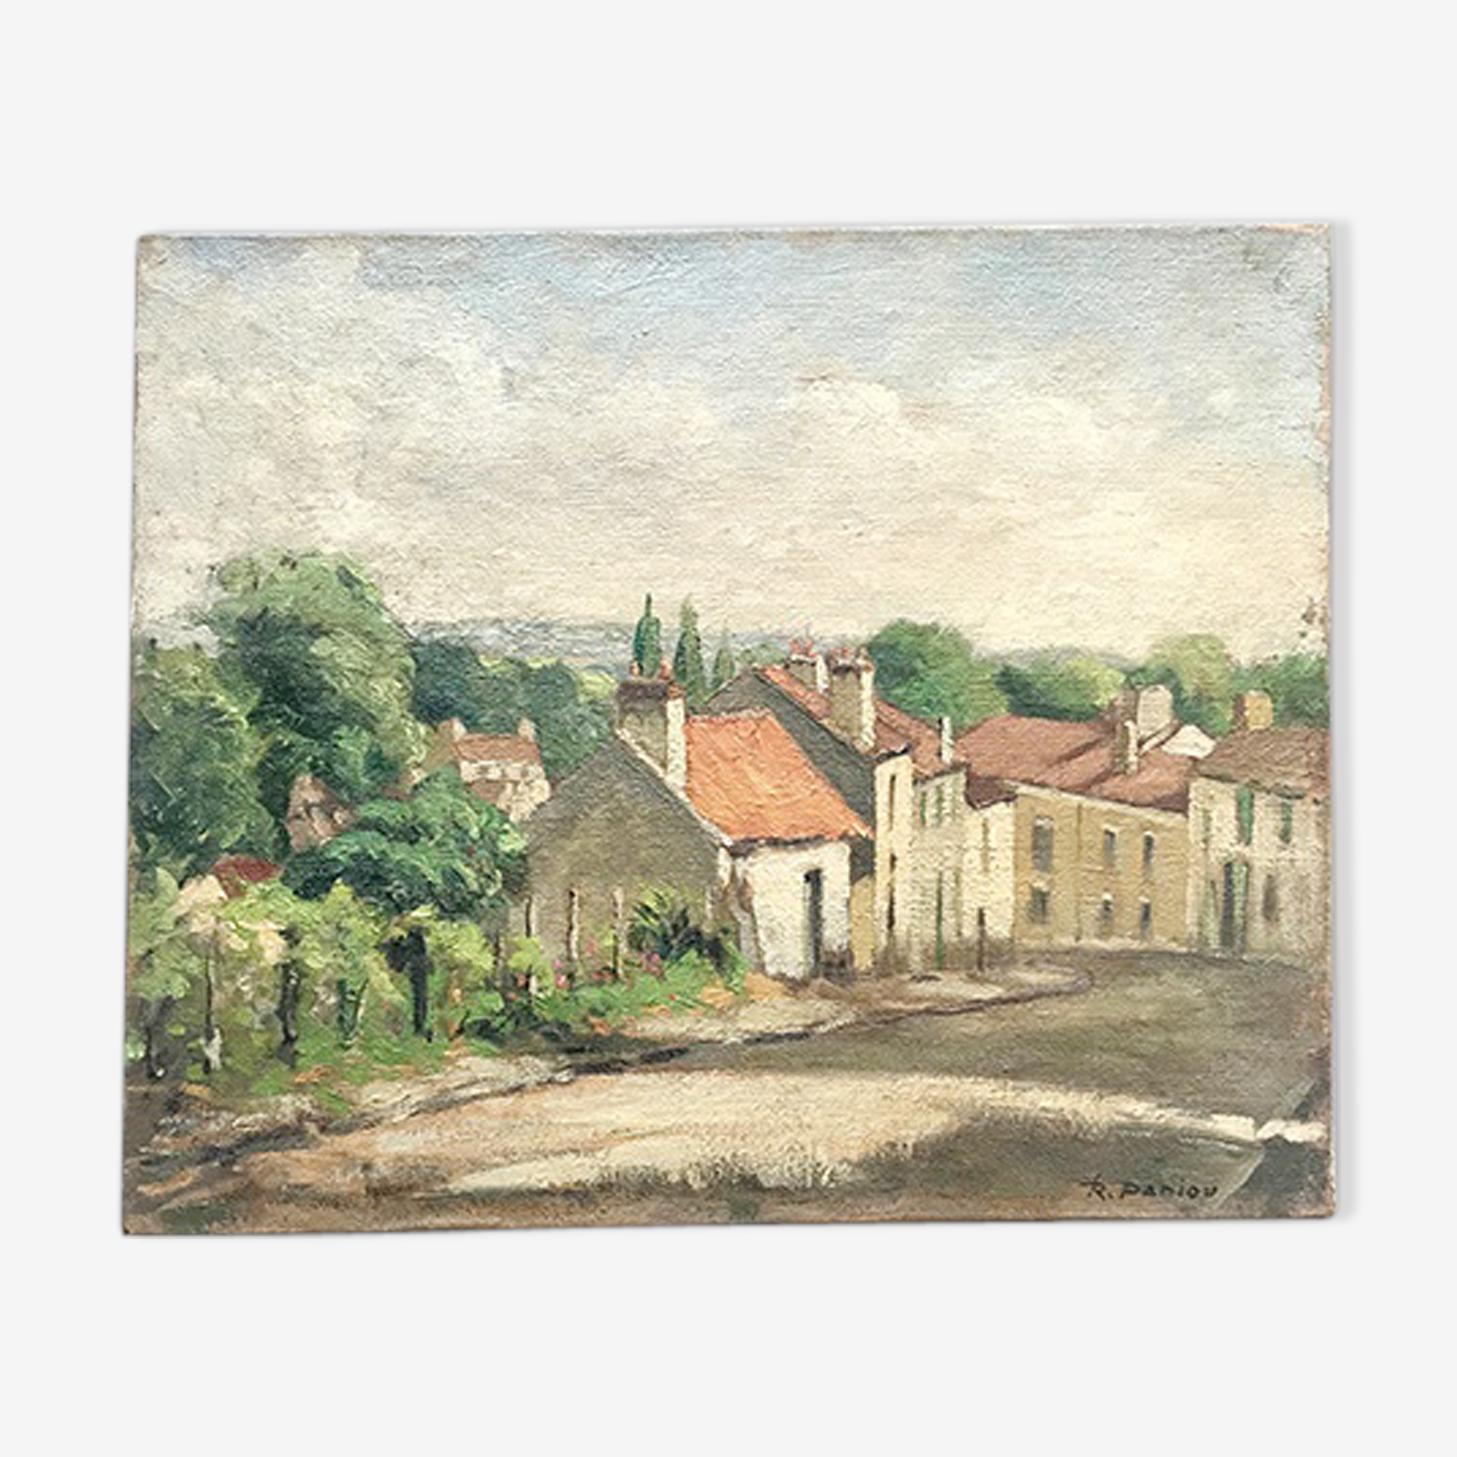 Picture of village lane